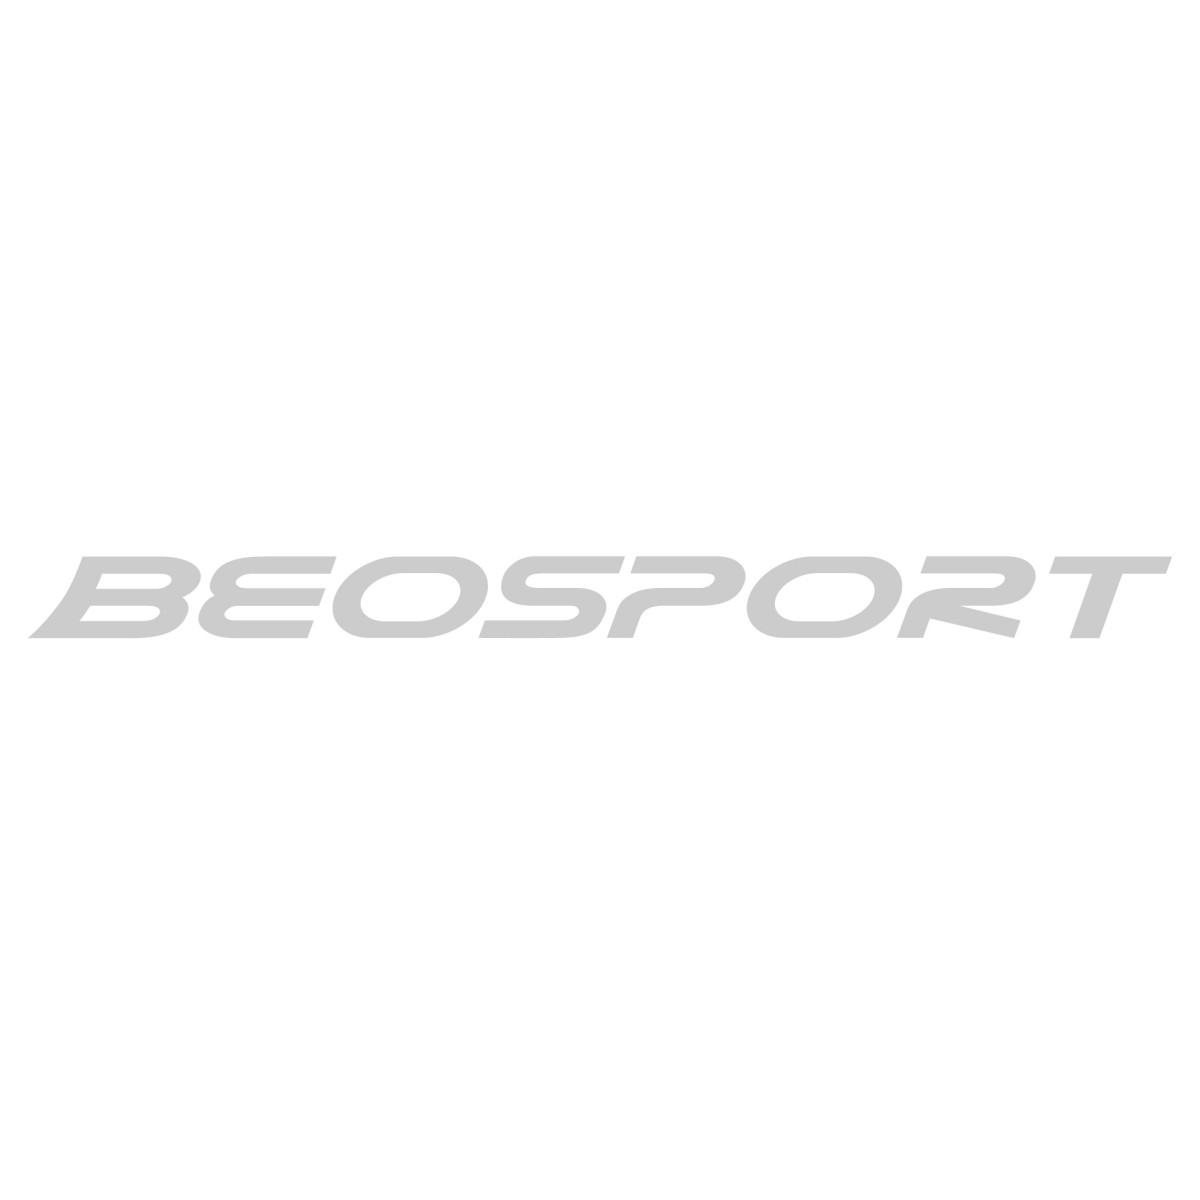 Wilson Ez linije za teren